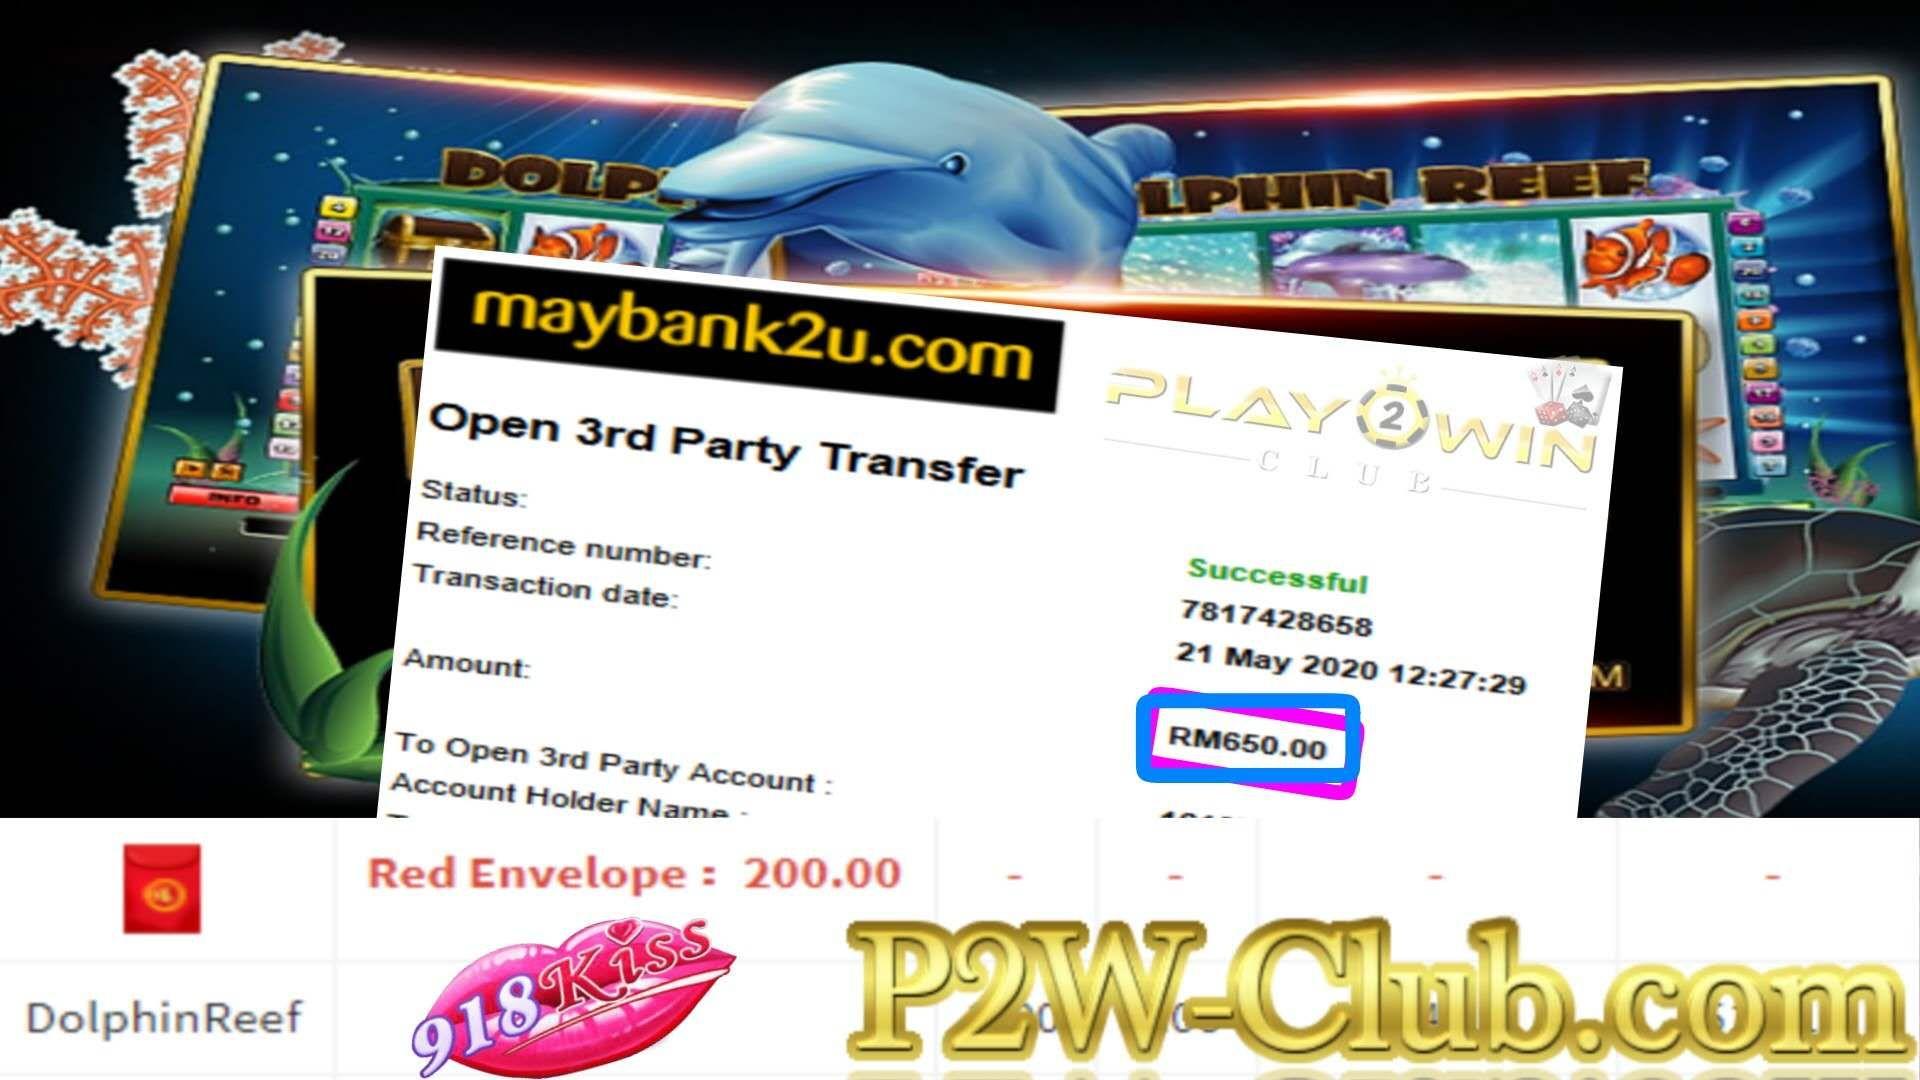 Dolphin Reef Free Red Envelope Games Kredit Online Casino Brunei | P2W-Club.com